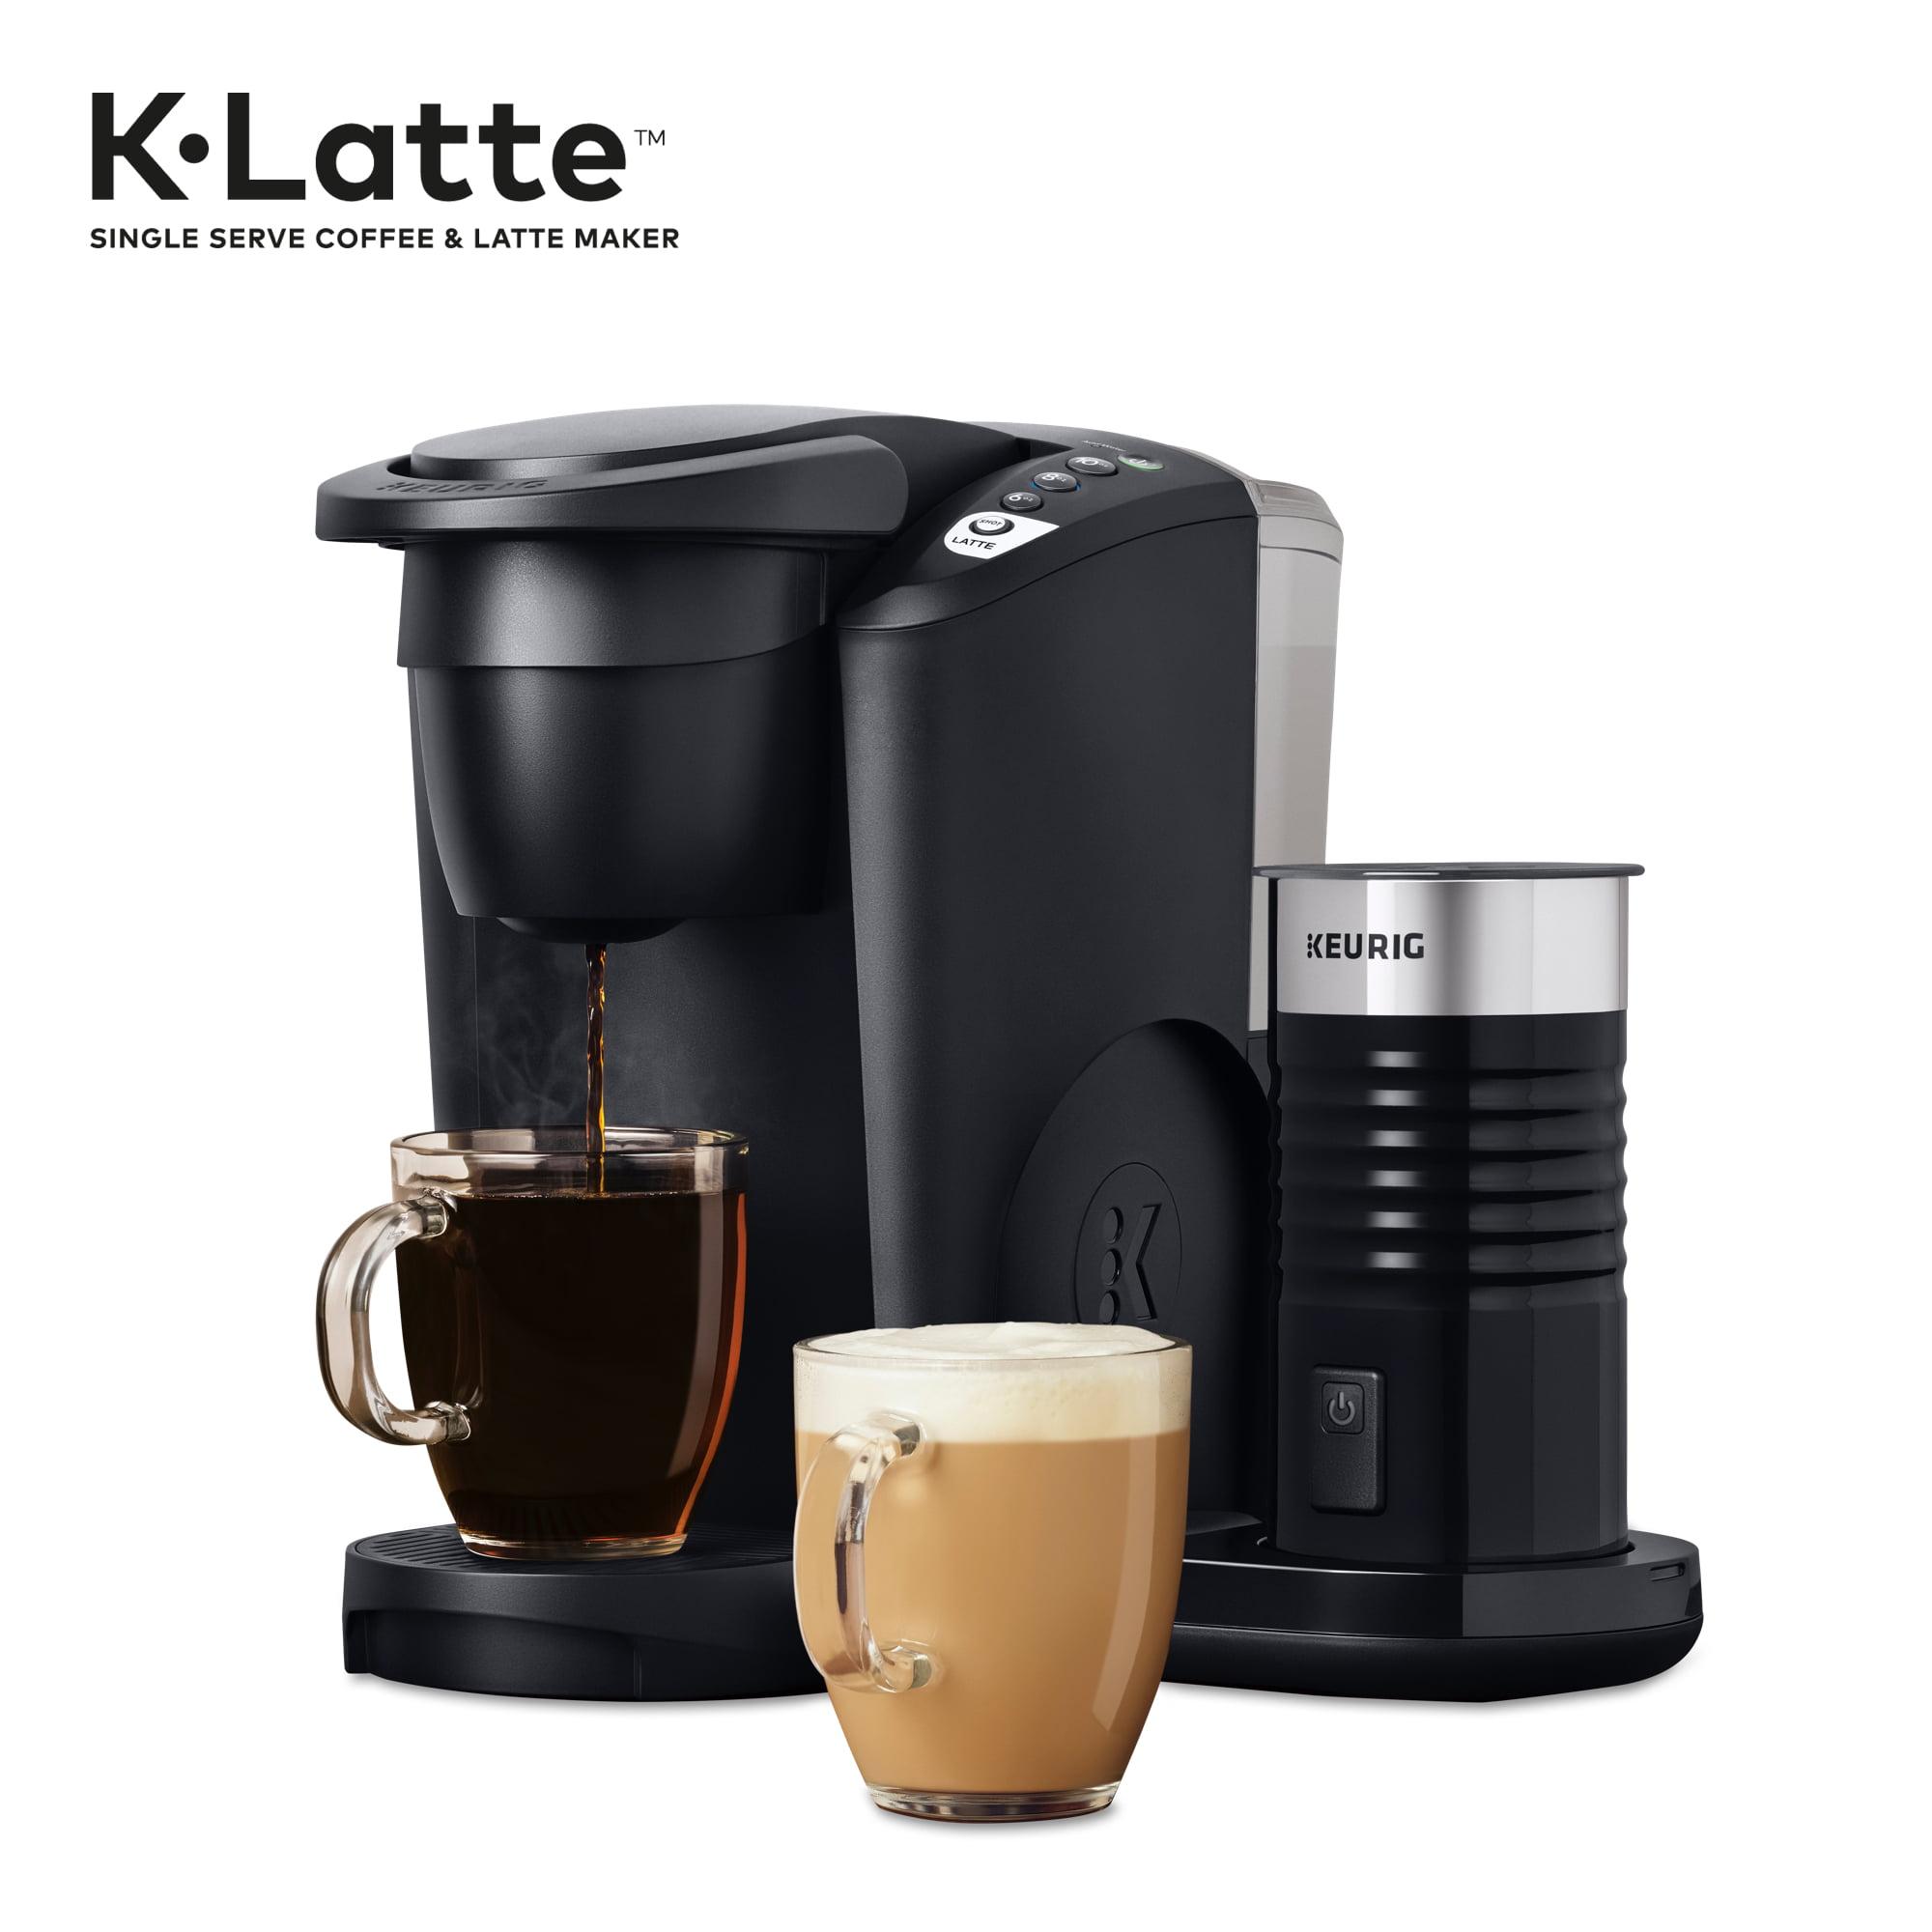 Buy Keurig K Latte Single Serve K Cup Coffee And Latte Maker Comes